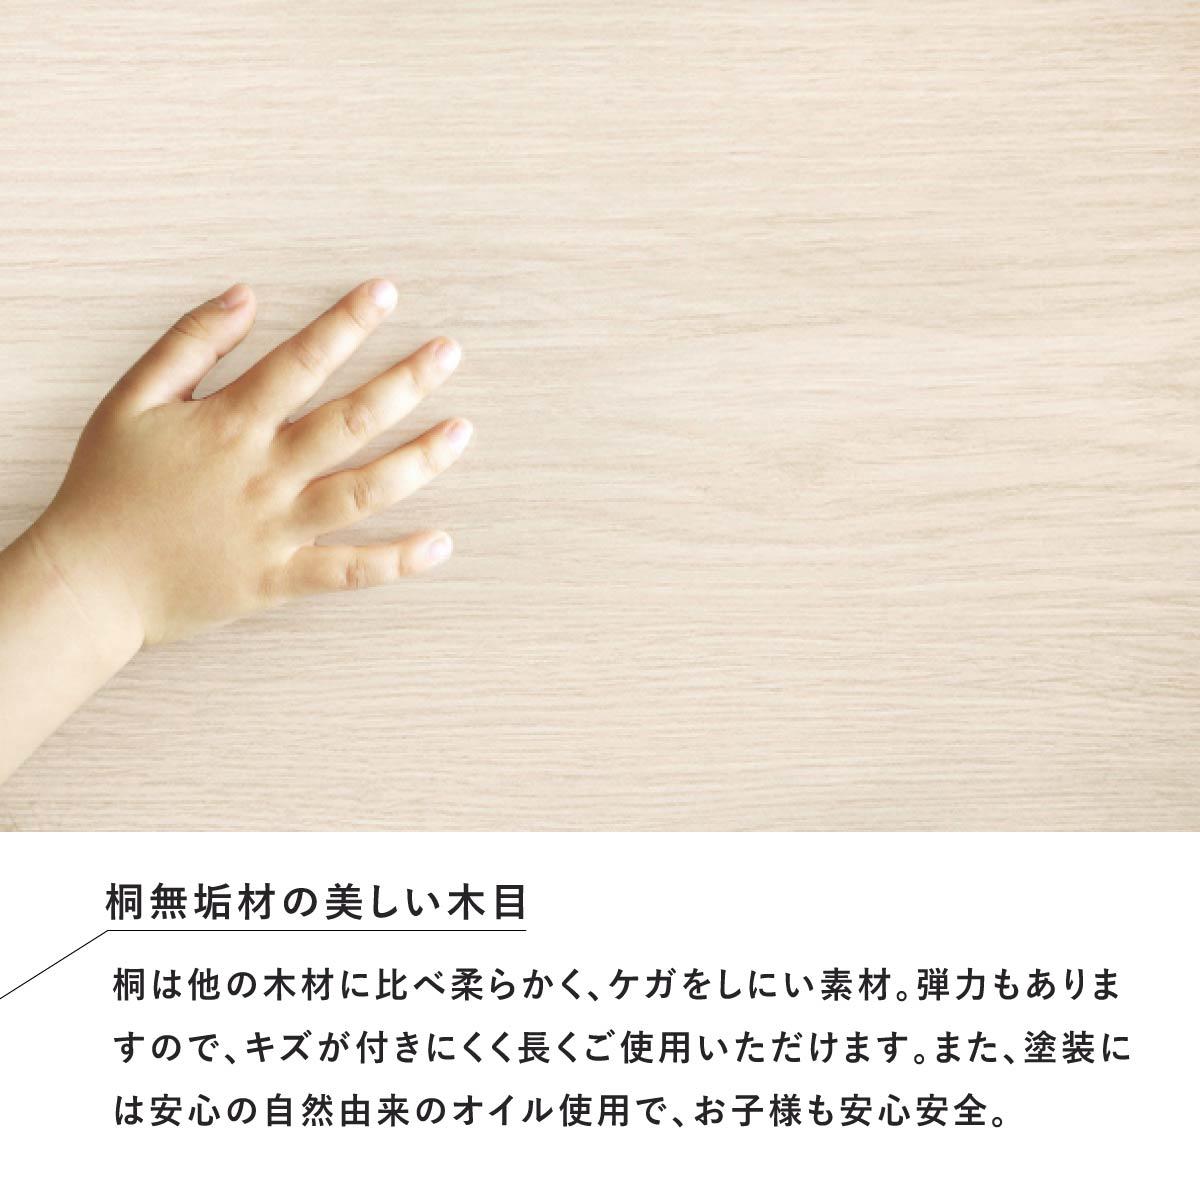 [幅40] 収納 チェスト 桐 無垢材 子供部屋収納  MY 40 桐チェスト